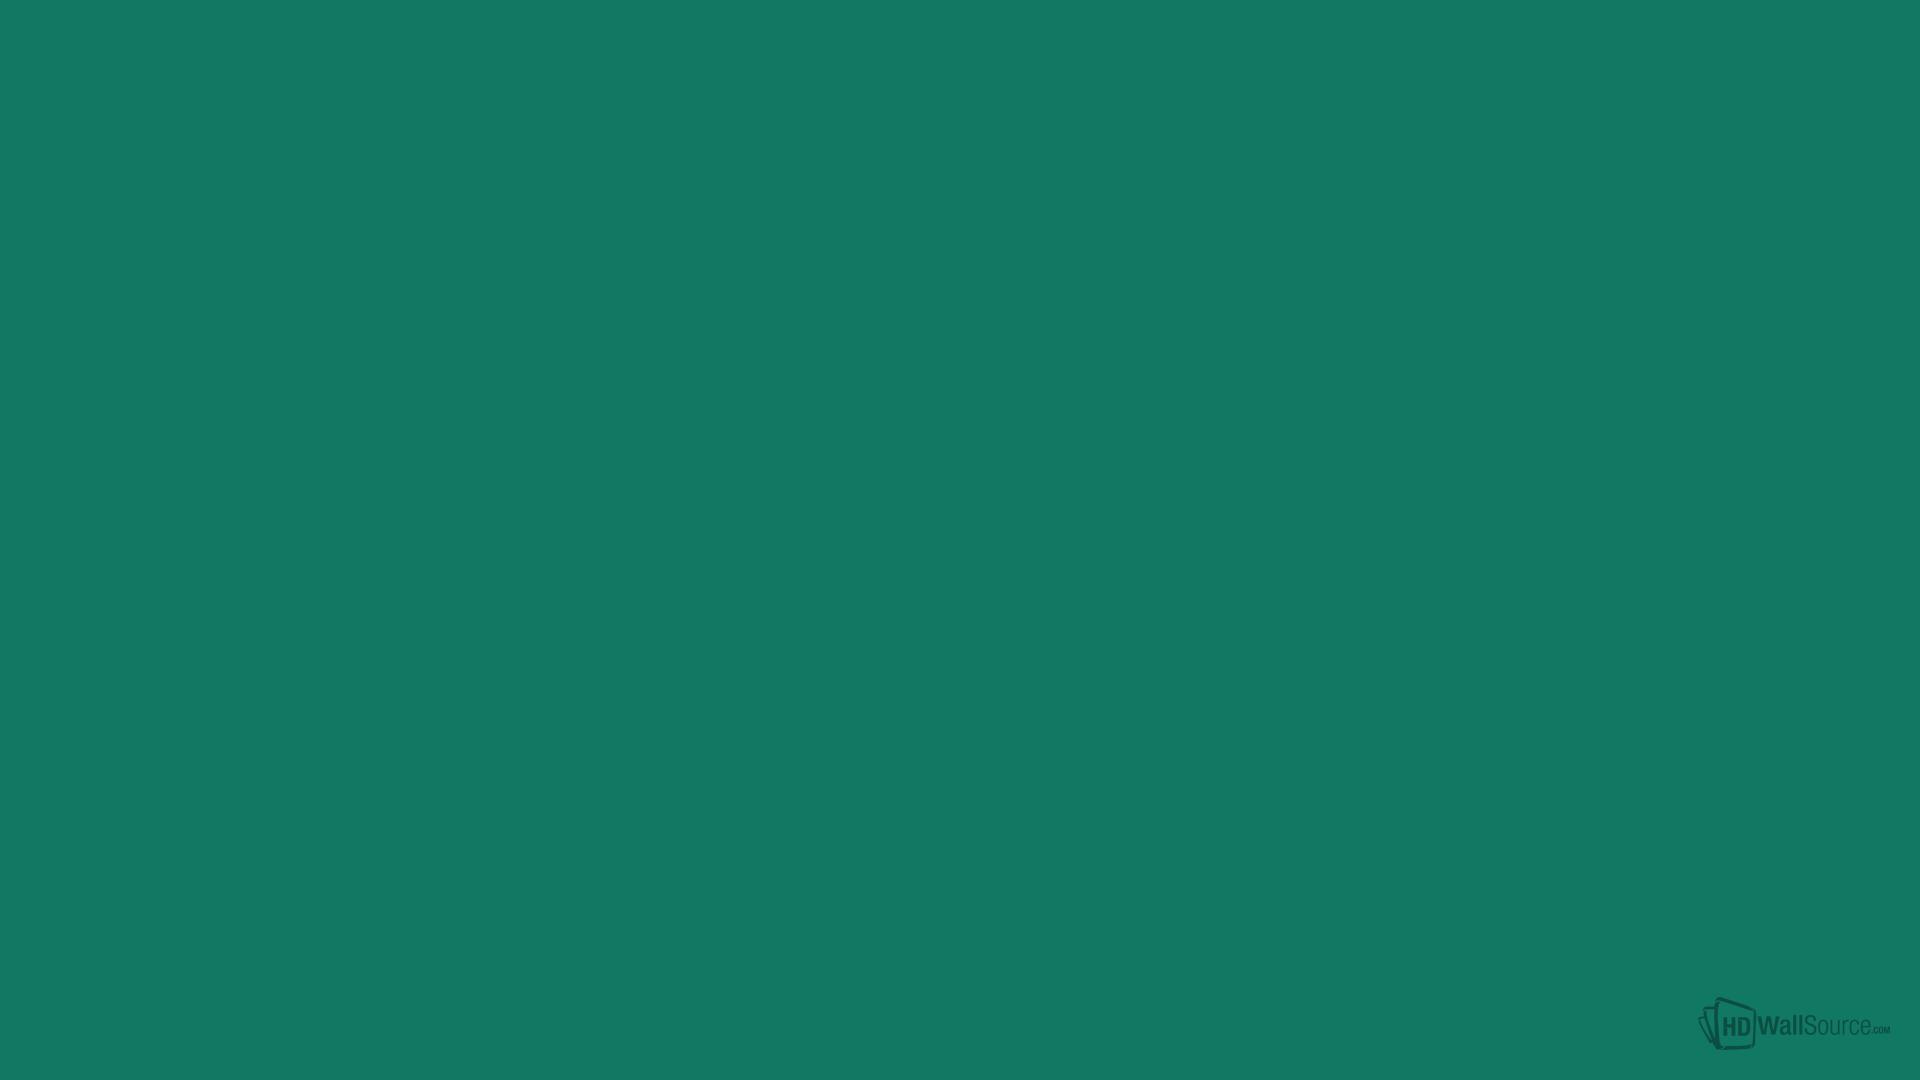 117864 wallpaper 70791